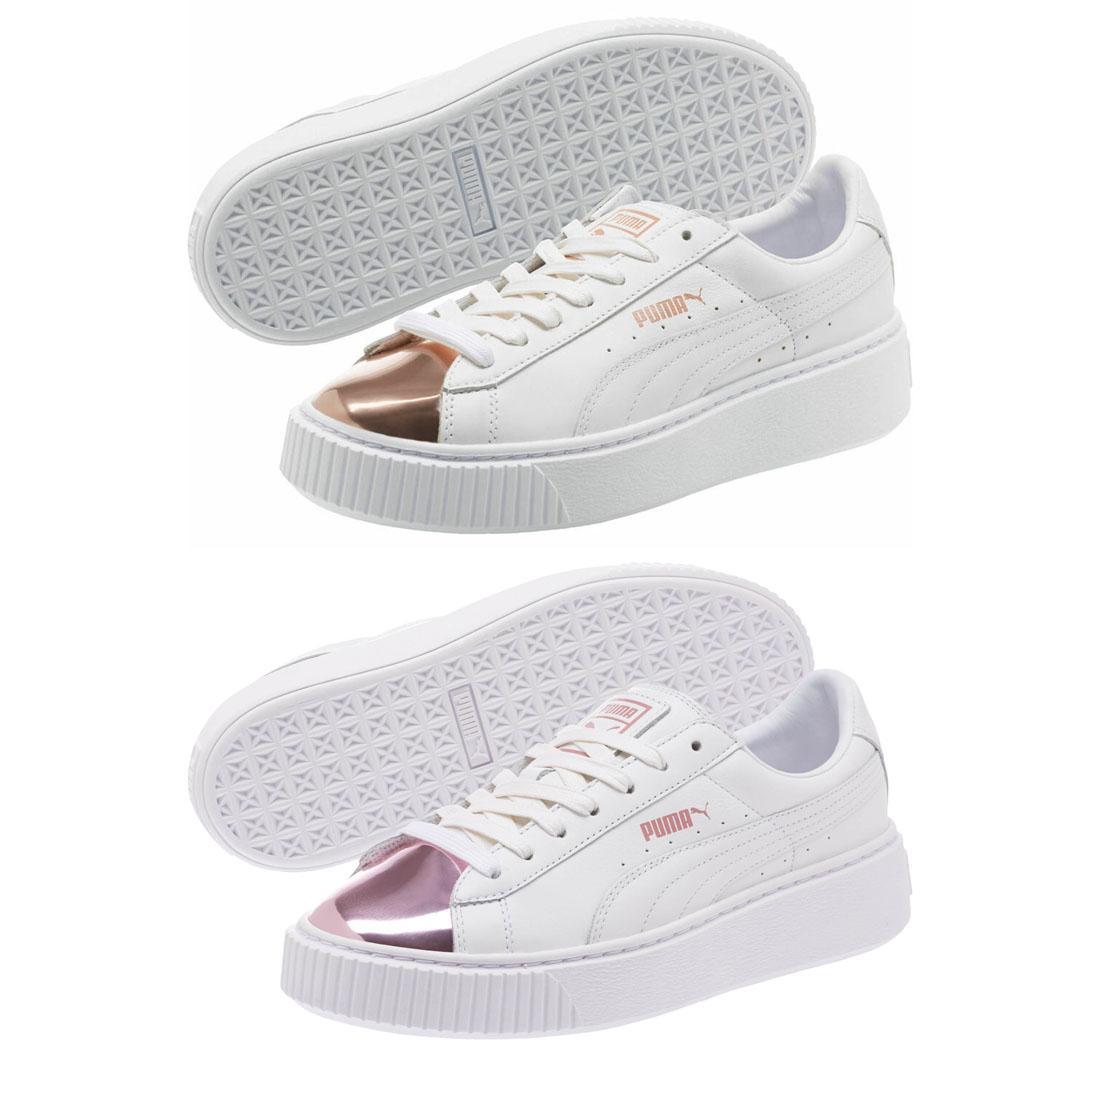 newest a6eb9 15620 Details about PUMA Basket Platform Trainers White Gold Metallic Rose Lilac  Ladies Shoes